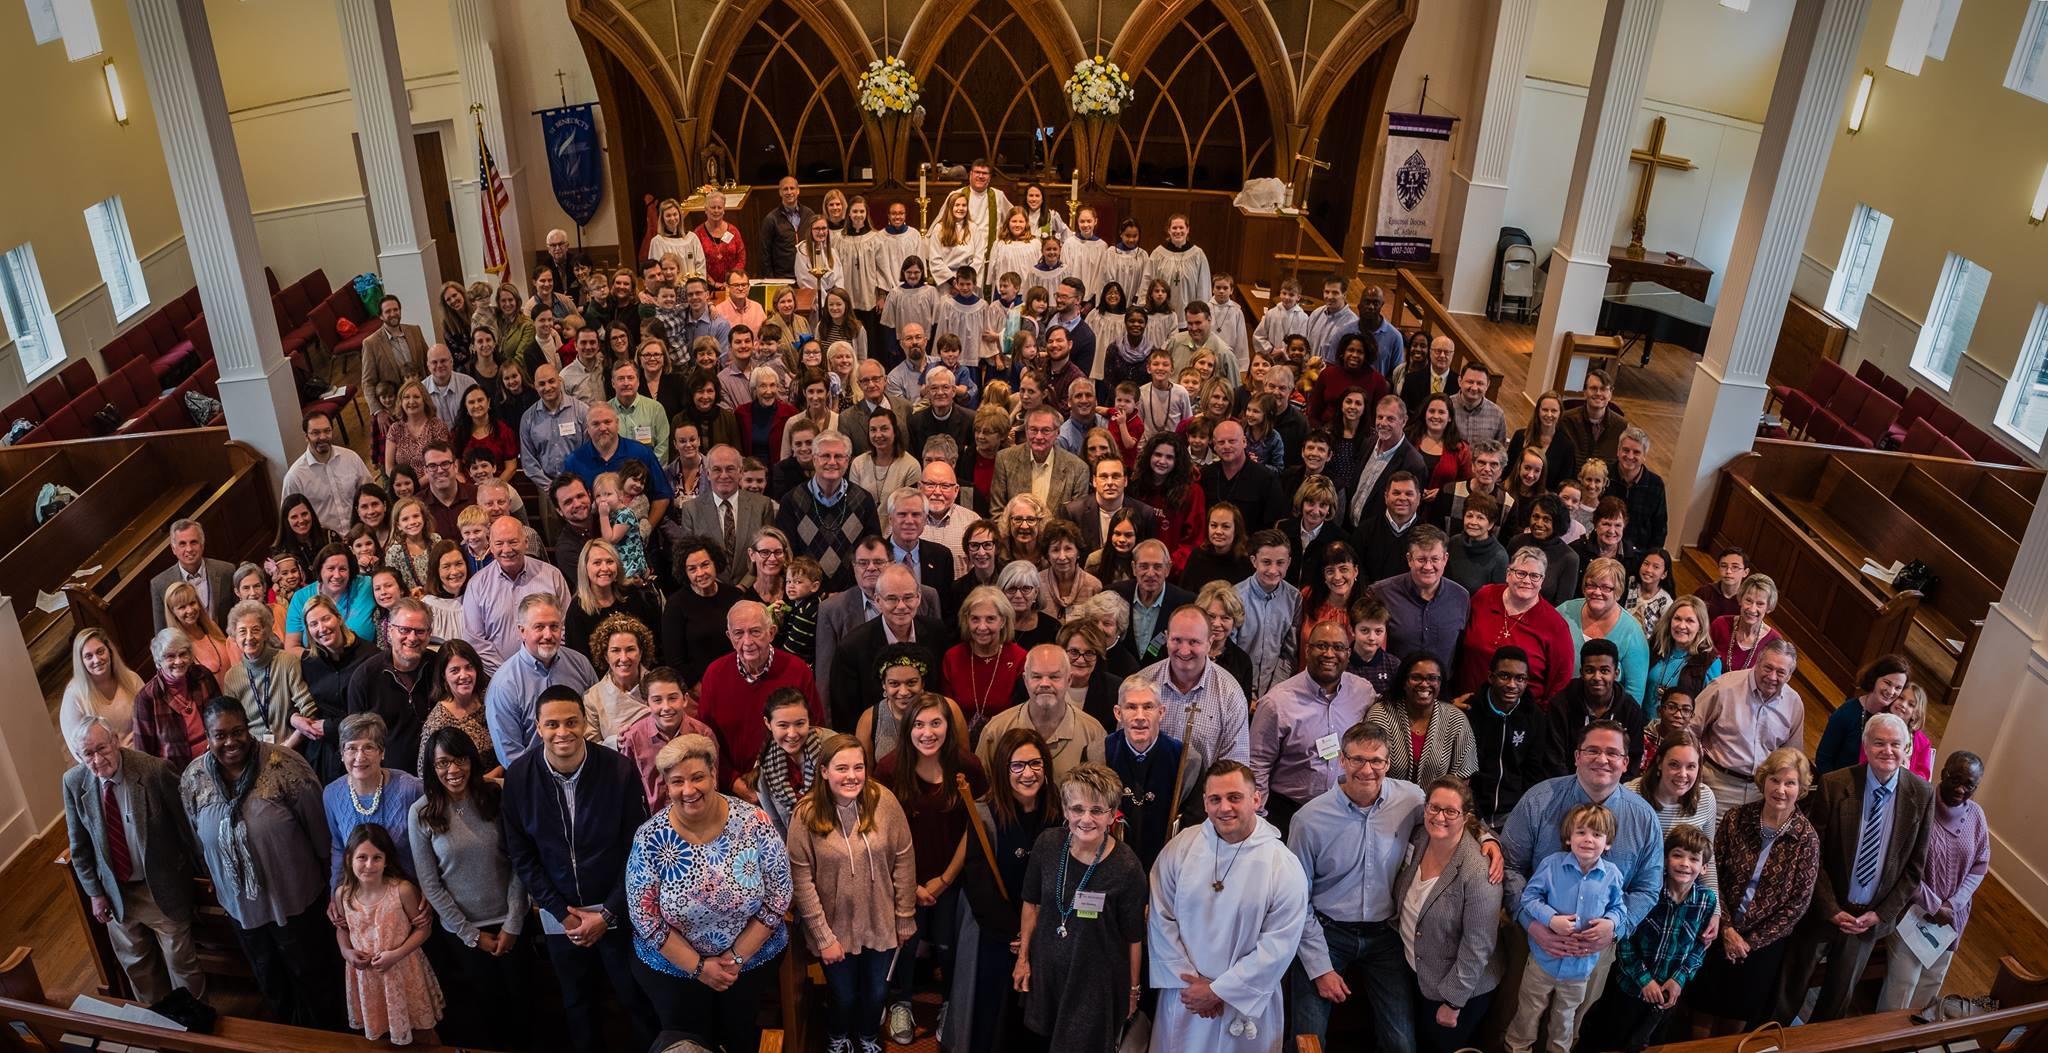 St  Benedict's Episcopal Church, Smyrna, GA | Episcopal Church